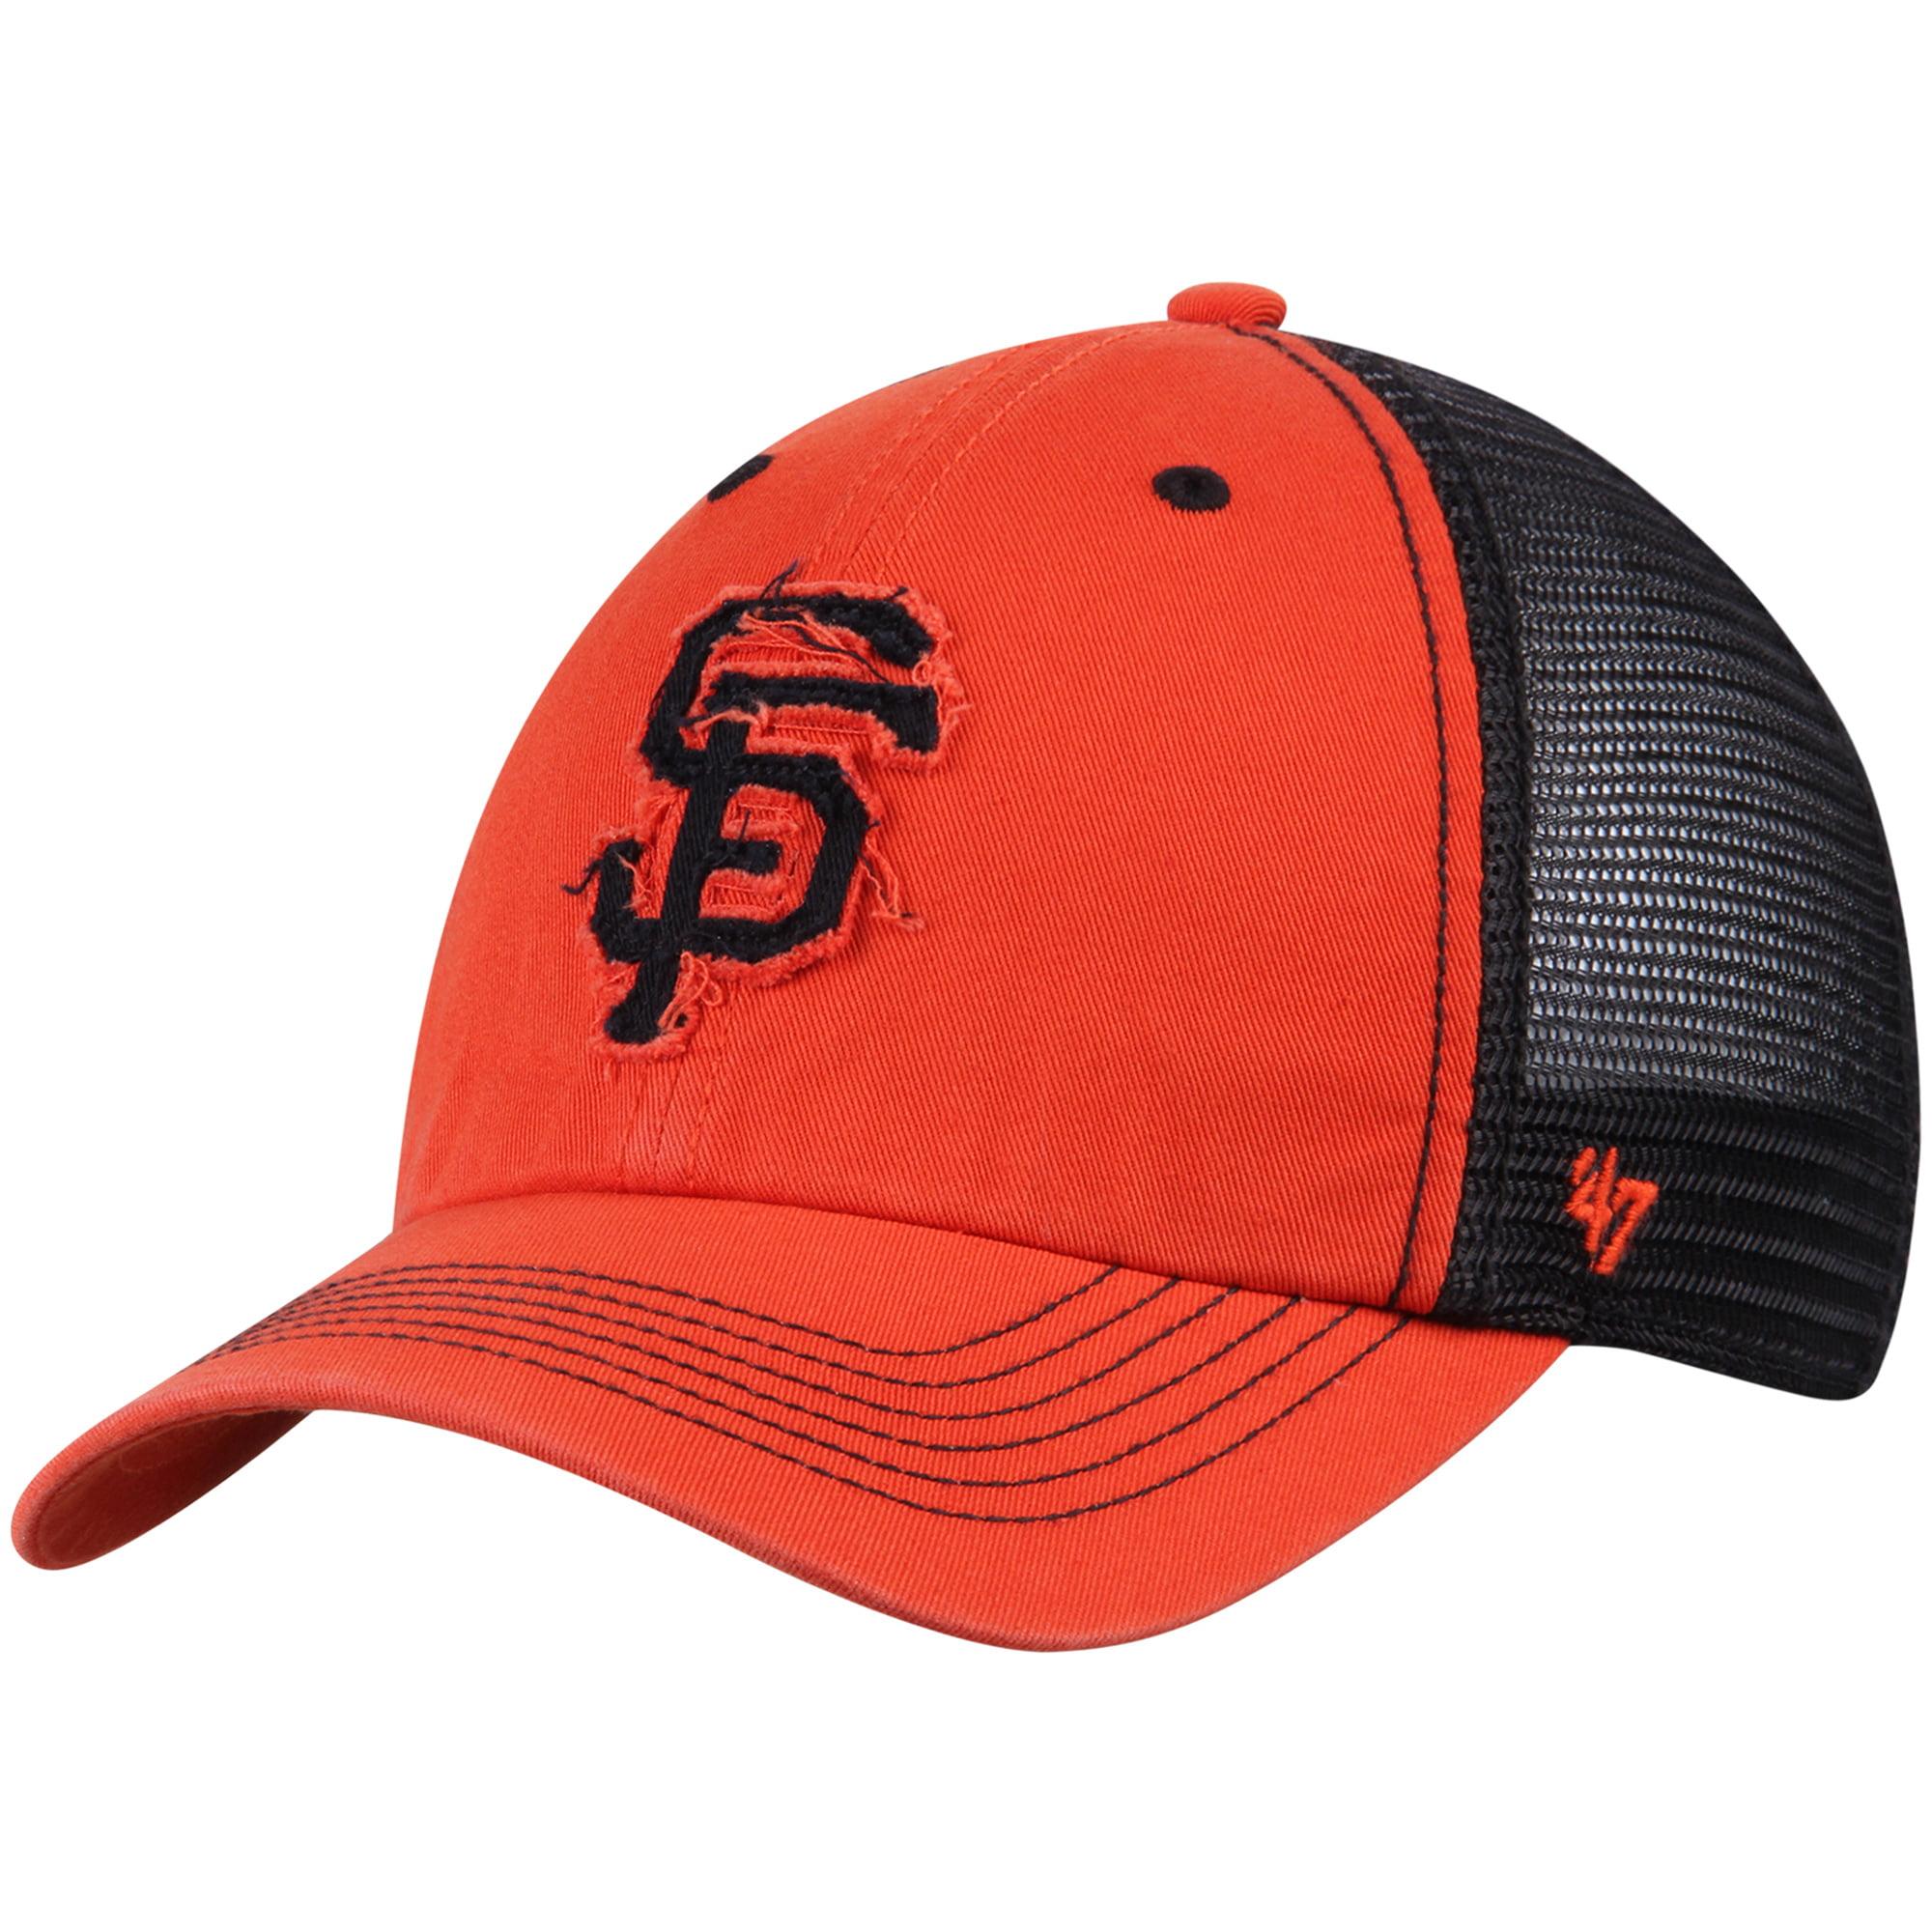 San Francisco Giants '47 Taylor Closer Flex Hat - Orange/Black